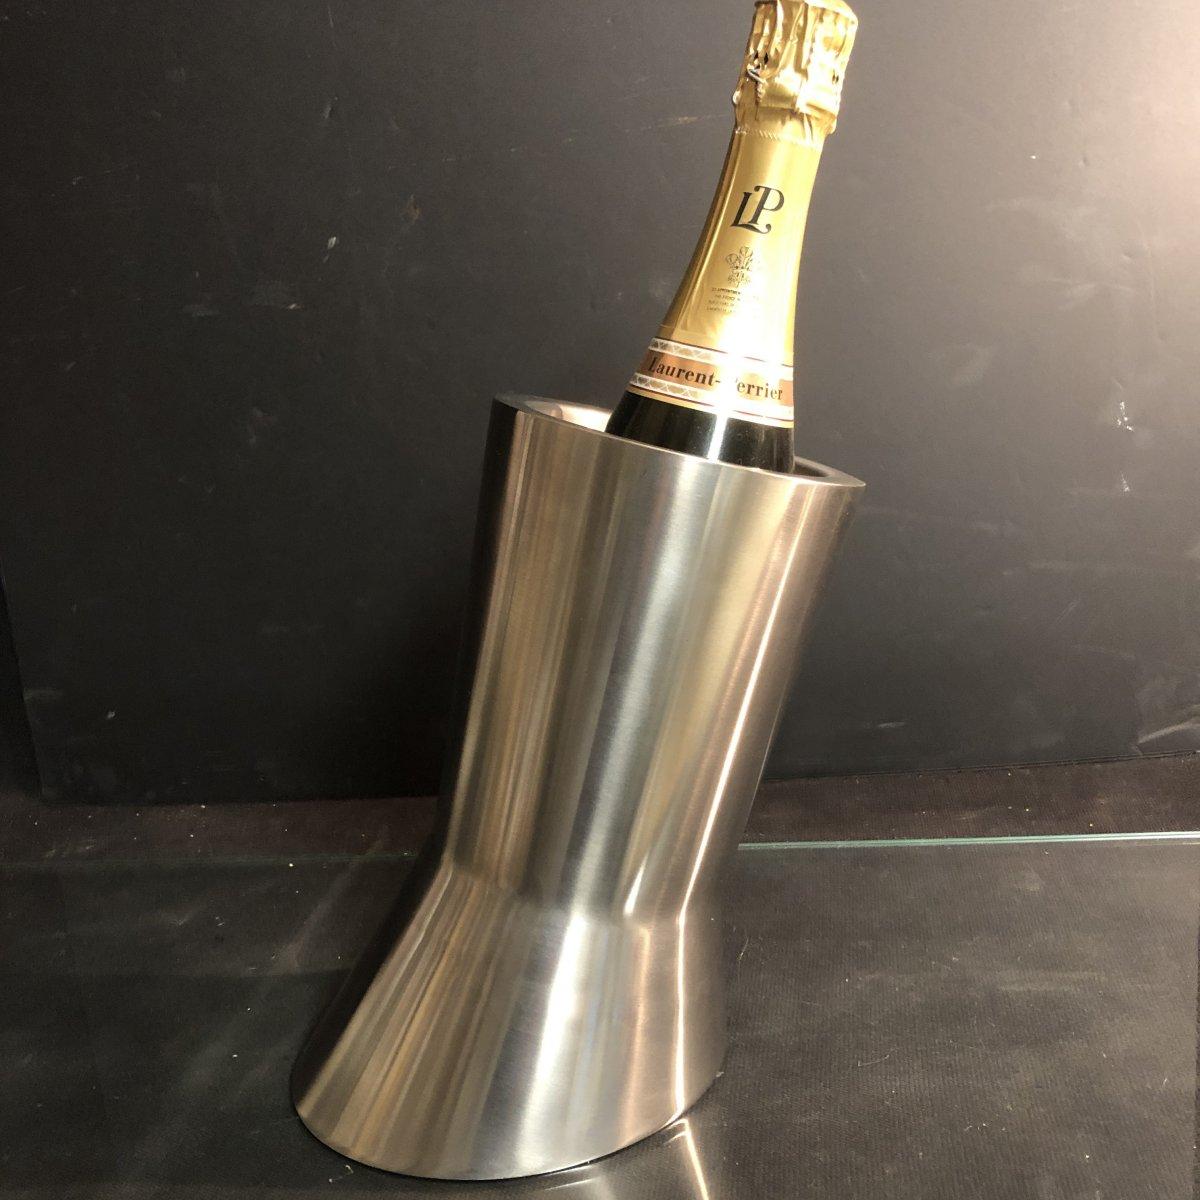 Seau à champagne Design en aluminium brossé rafraîchissoir 1970